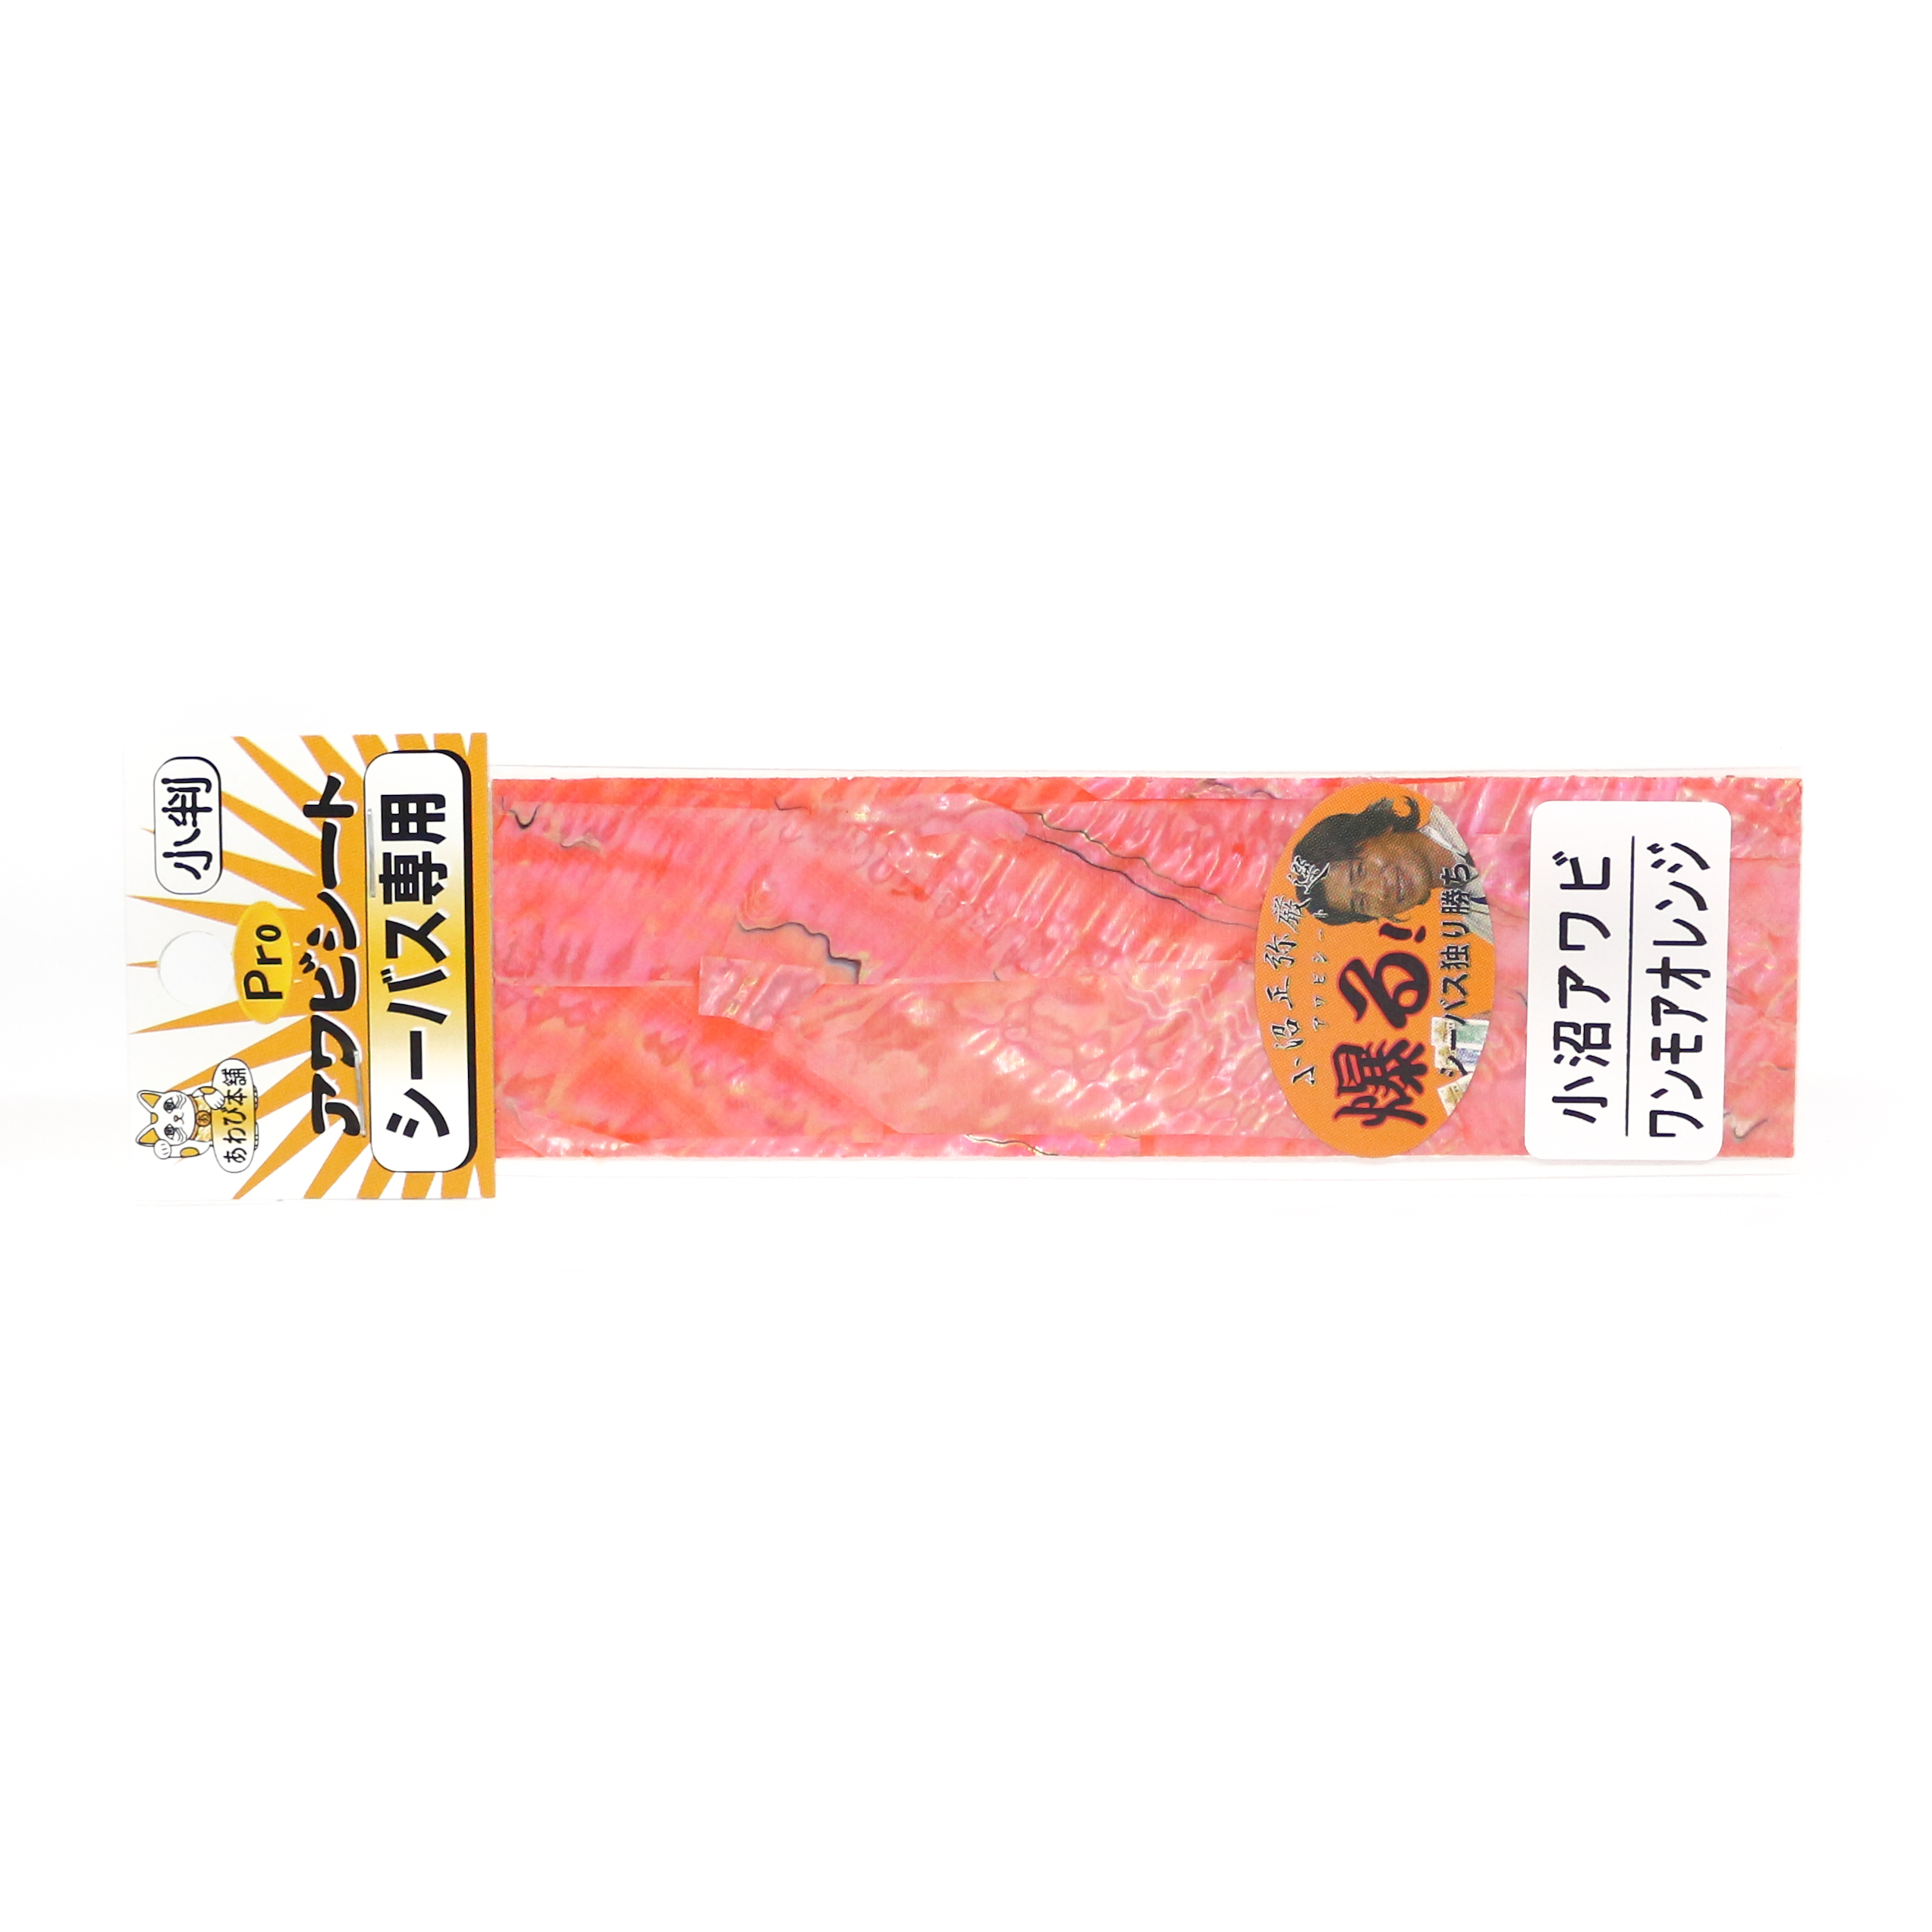 Sale Awabi Honpo Pro Awabi Sheet Konuma Size S 40 x 140 mm Orange (2563)